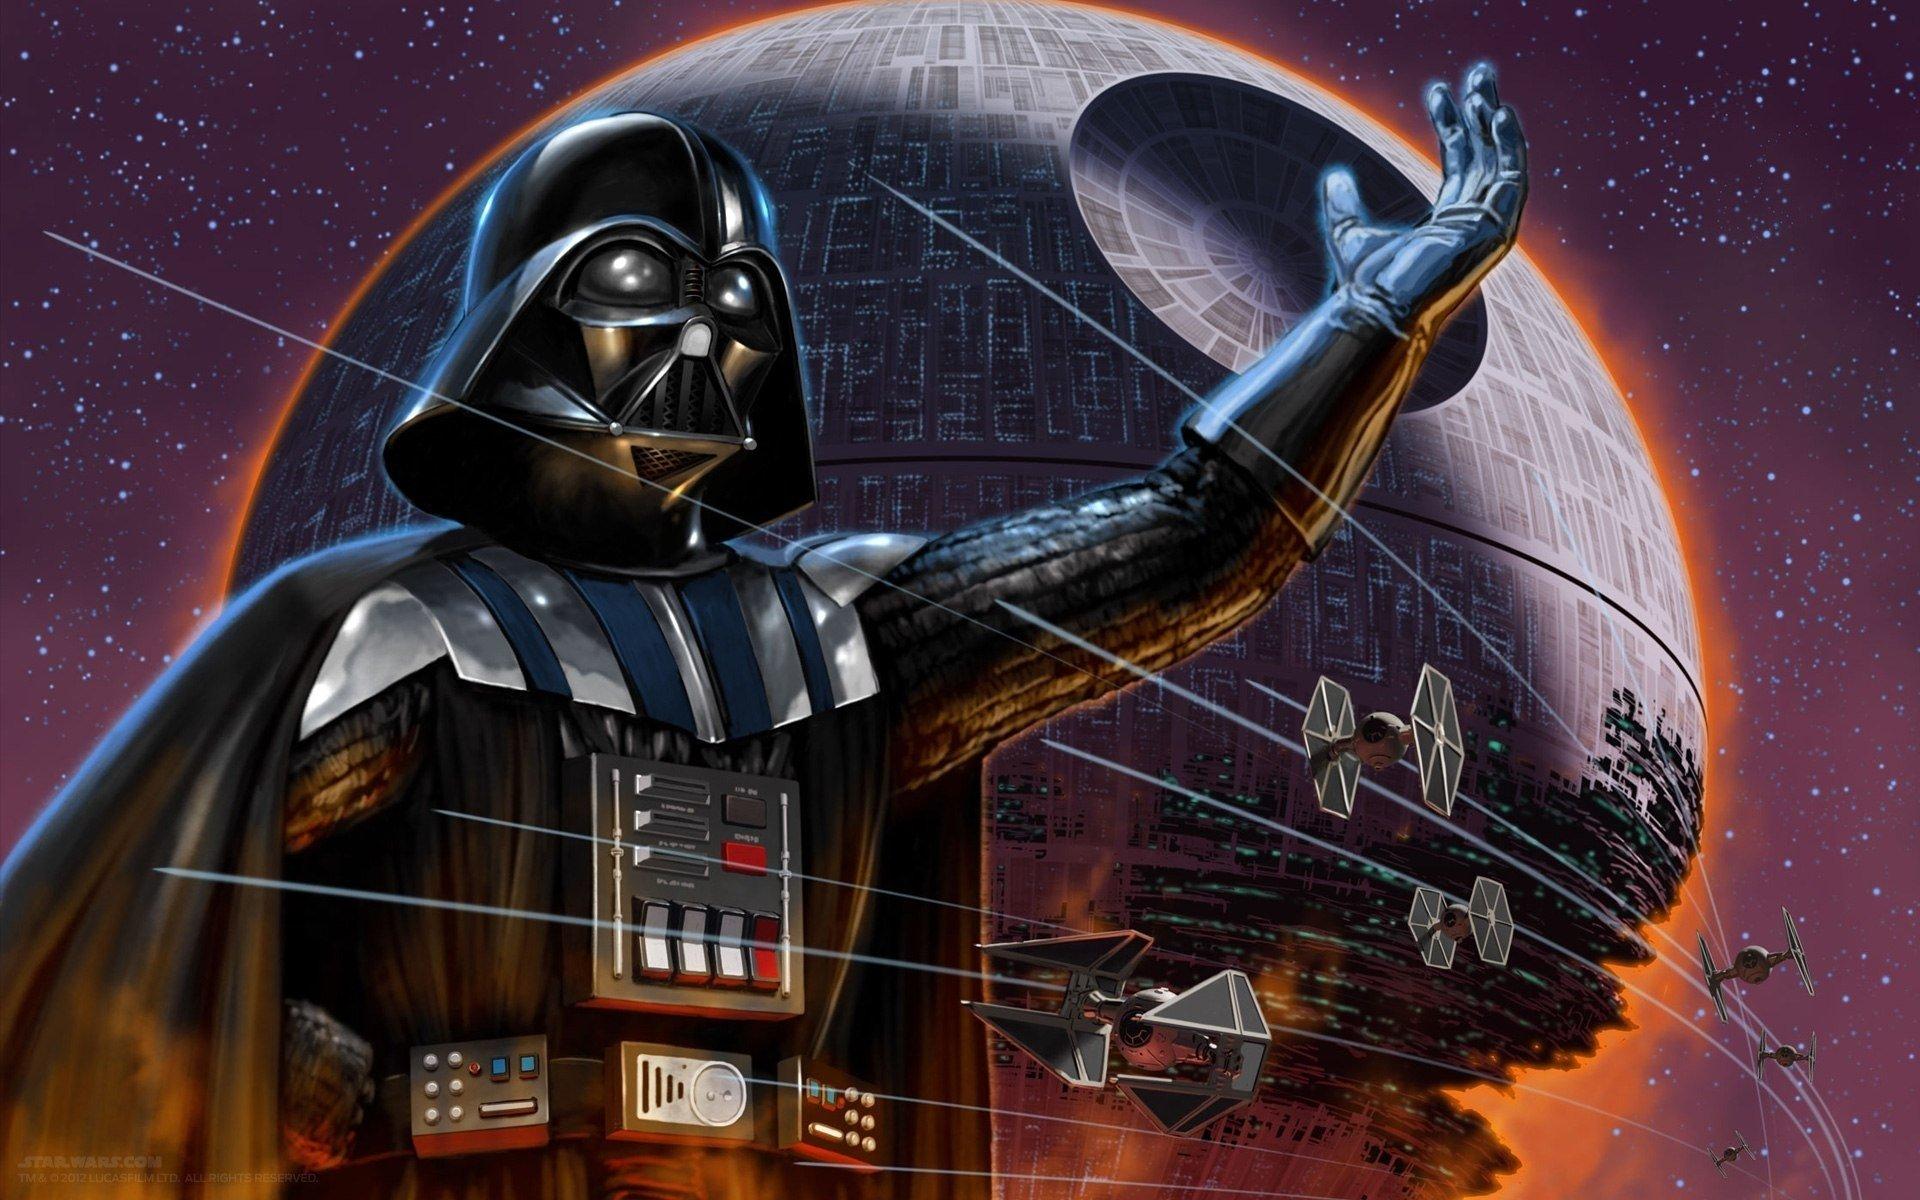 Star Wars Hd Wallpaper Background Image 1920x1200 Id 478660